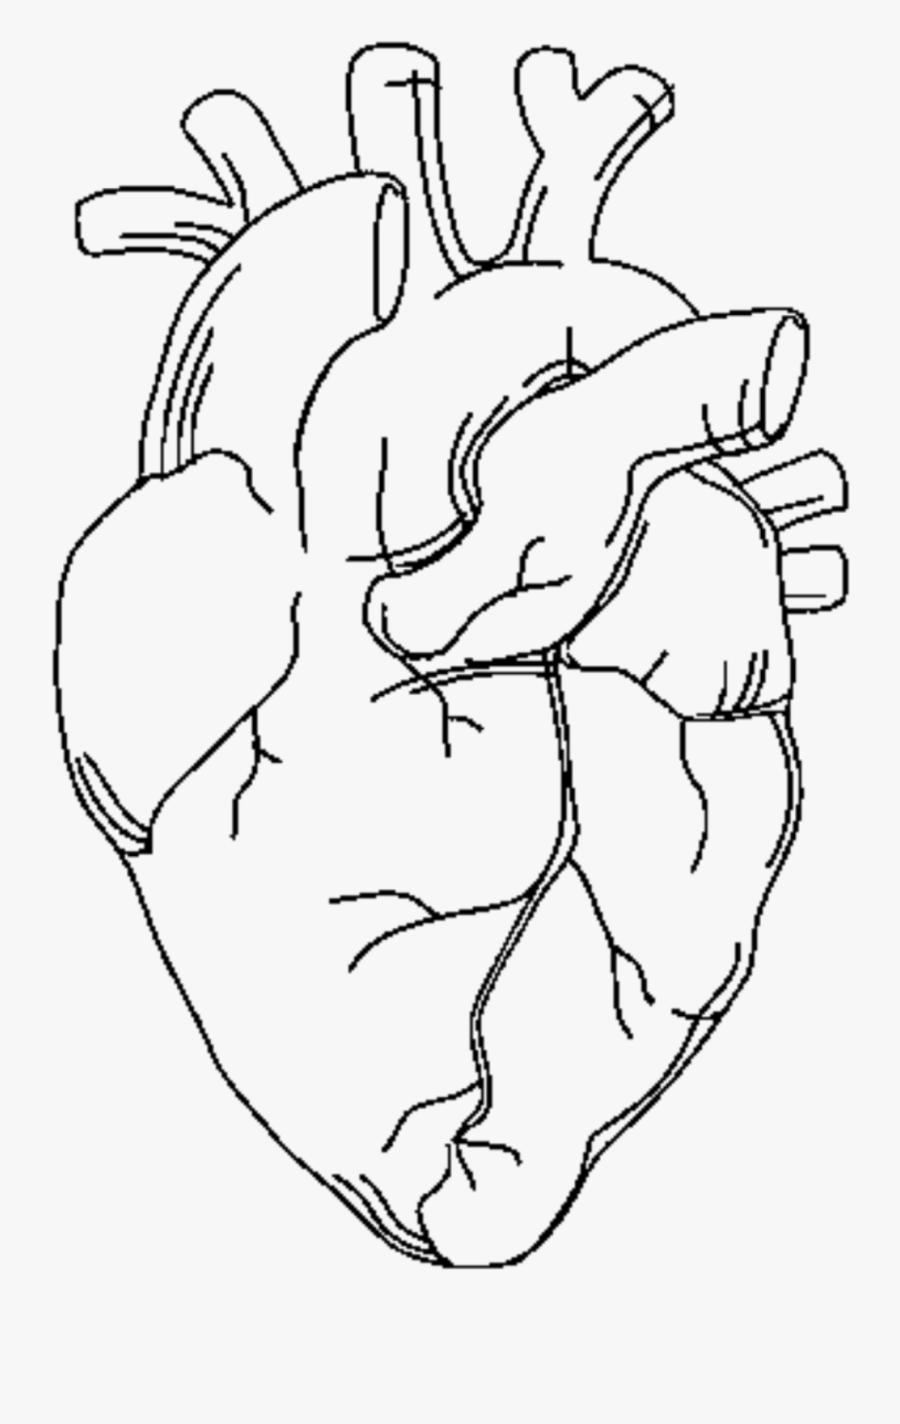 1409109_heart Anatomy Png Anatomicalheart Tattoo ...